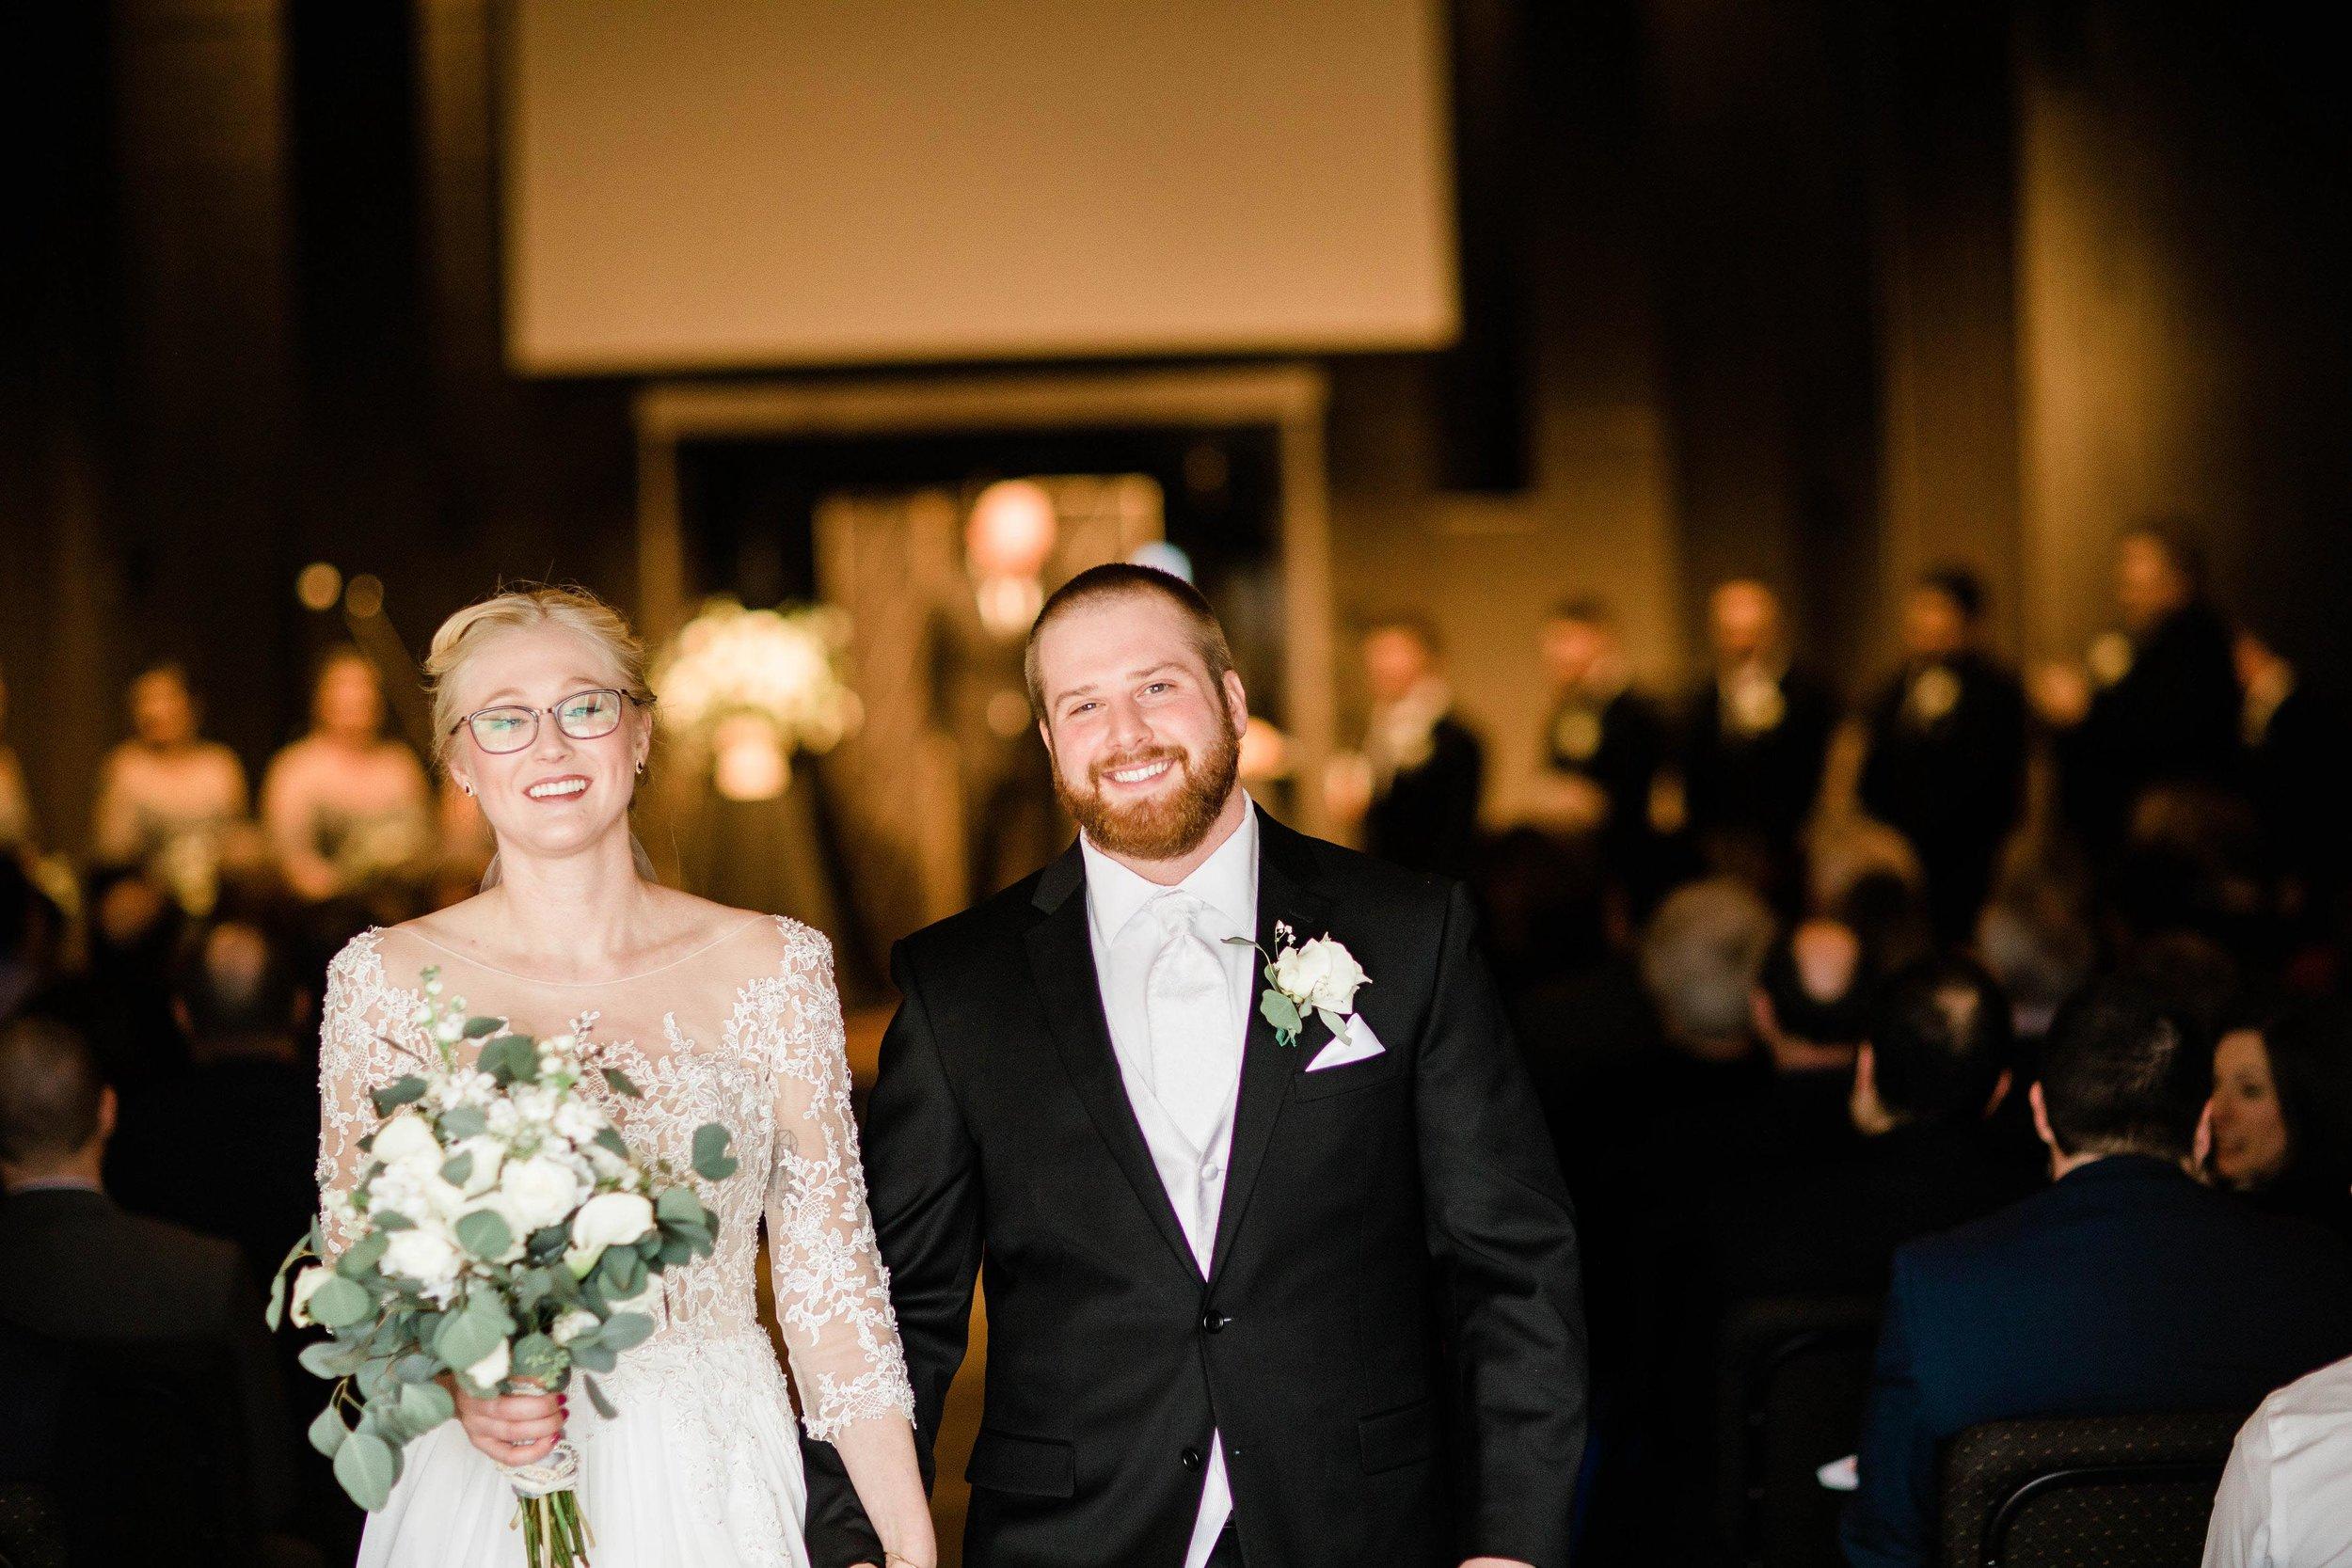 dayton wedding photography-3.jpg